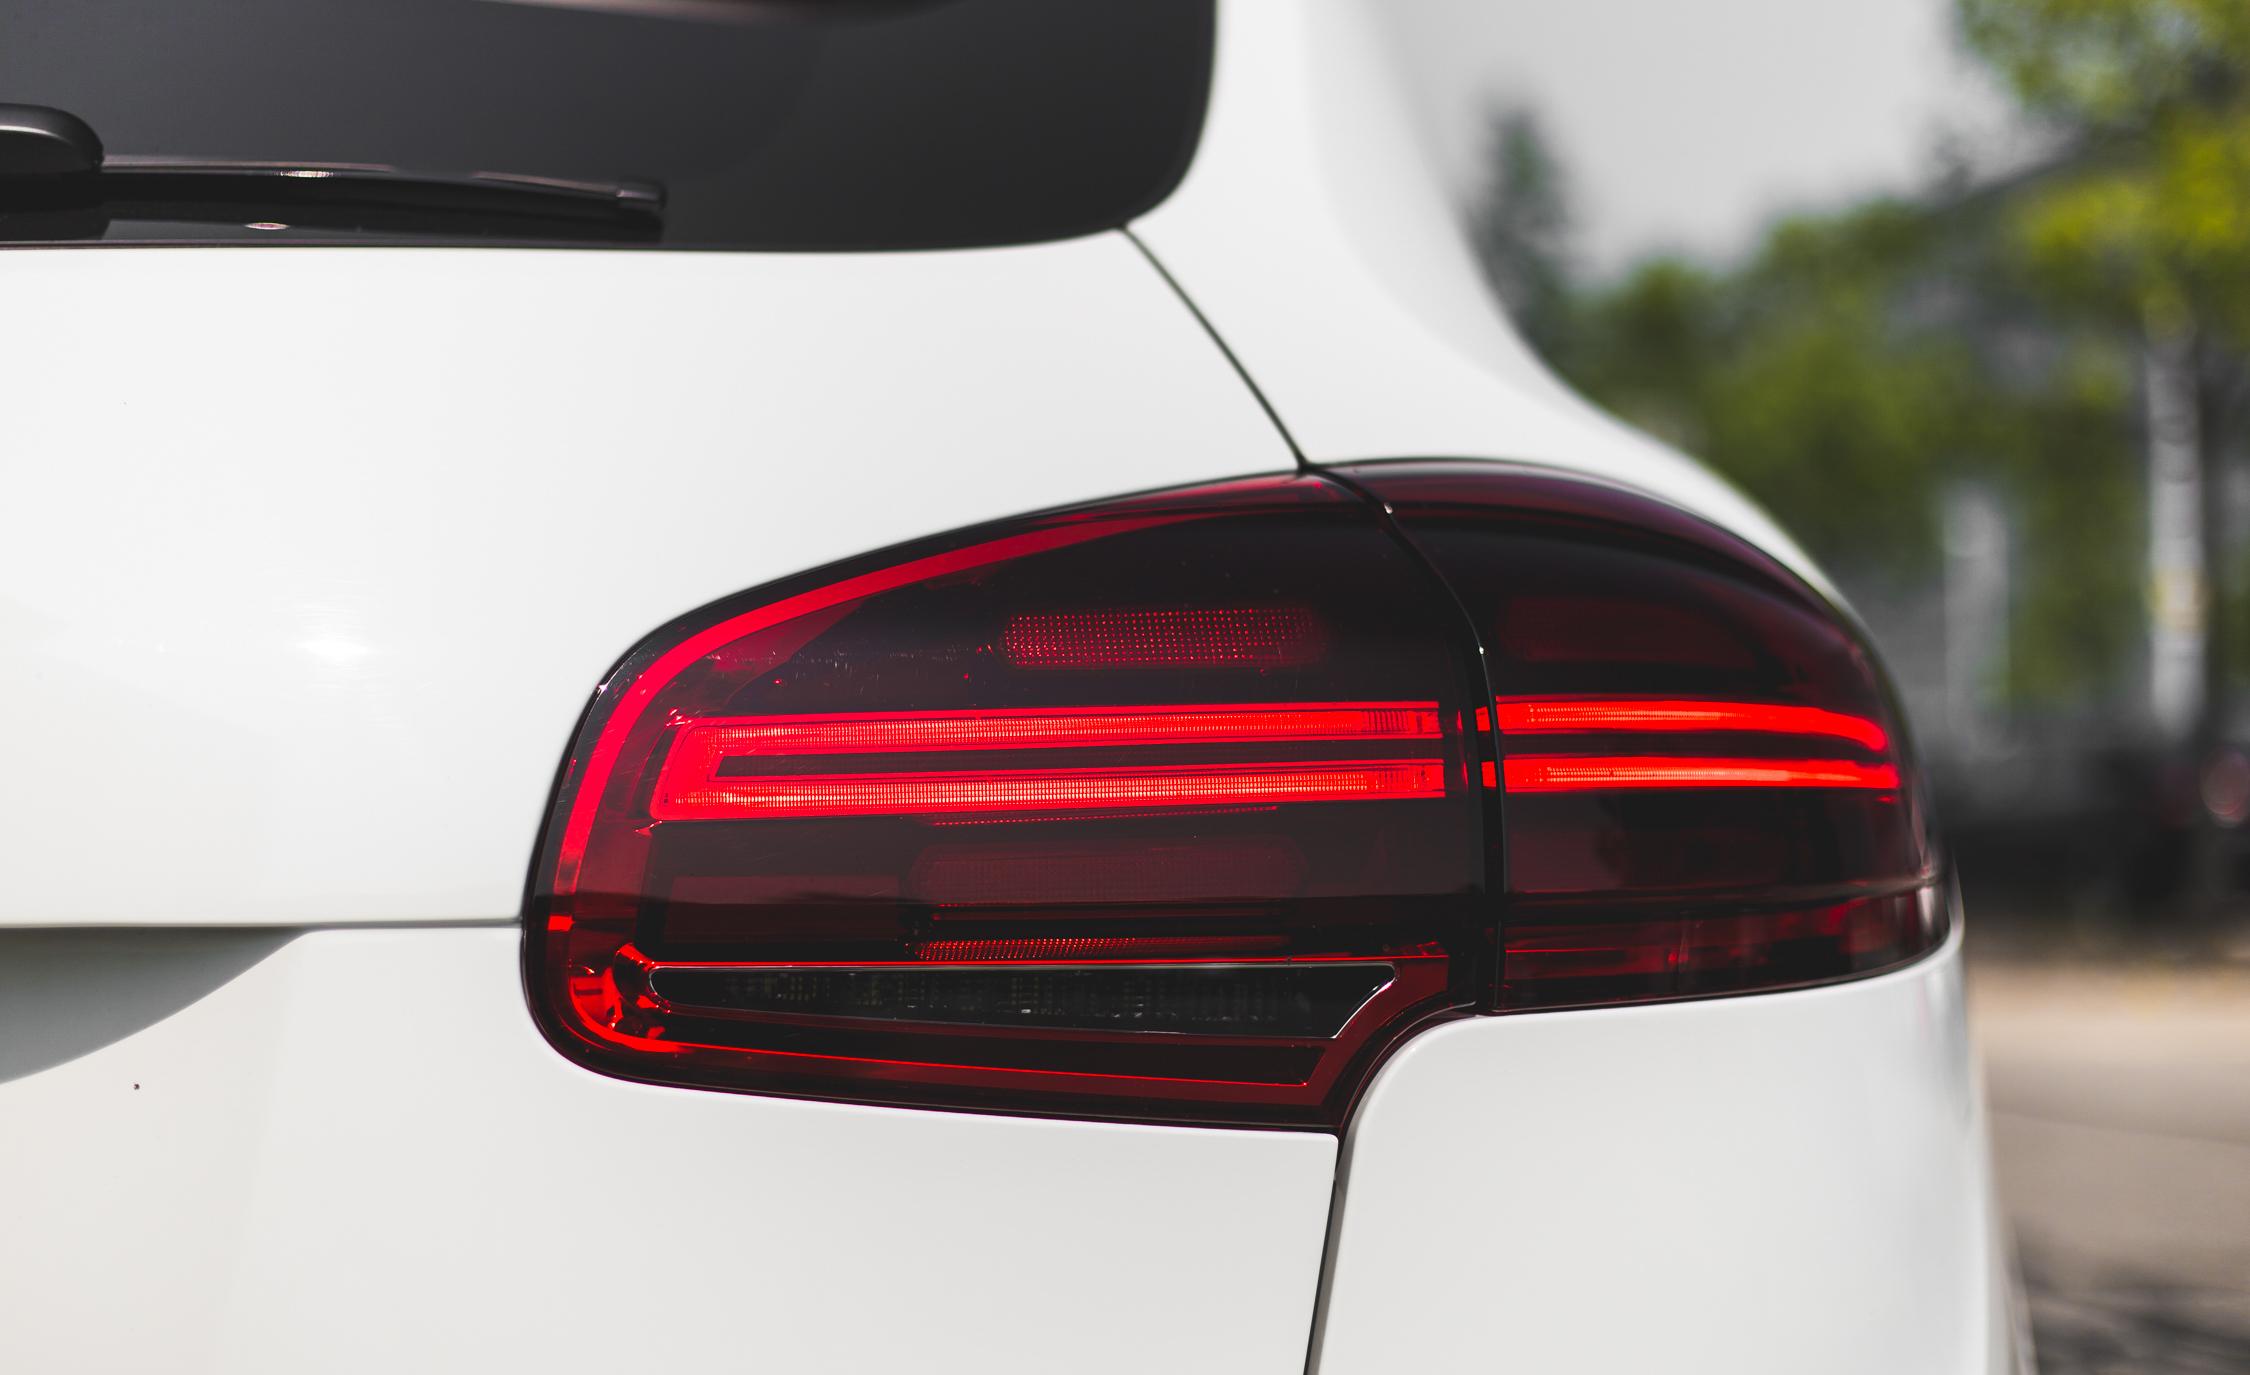 Taillight Porsche Cayenne S E-Hybrid 2015